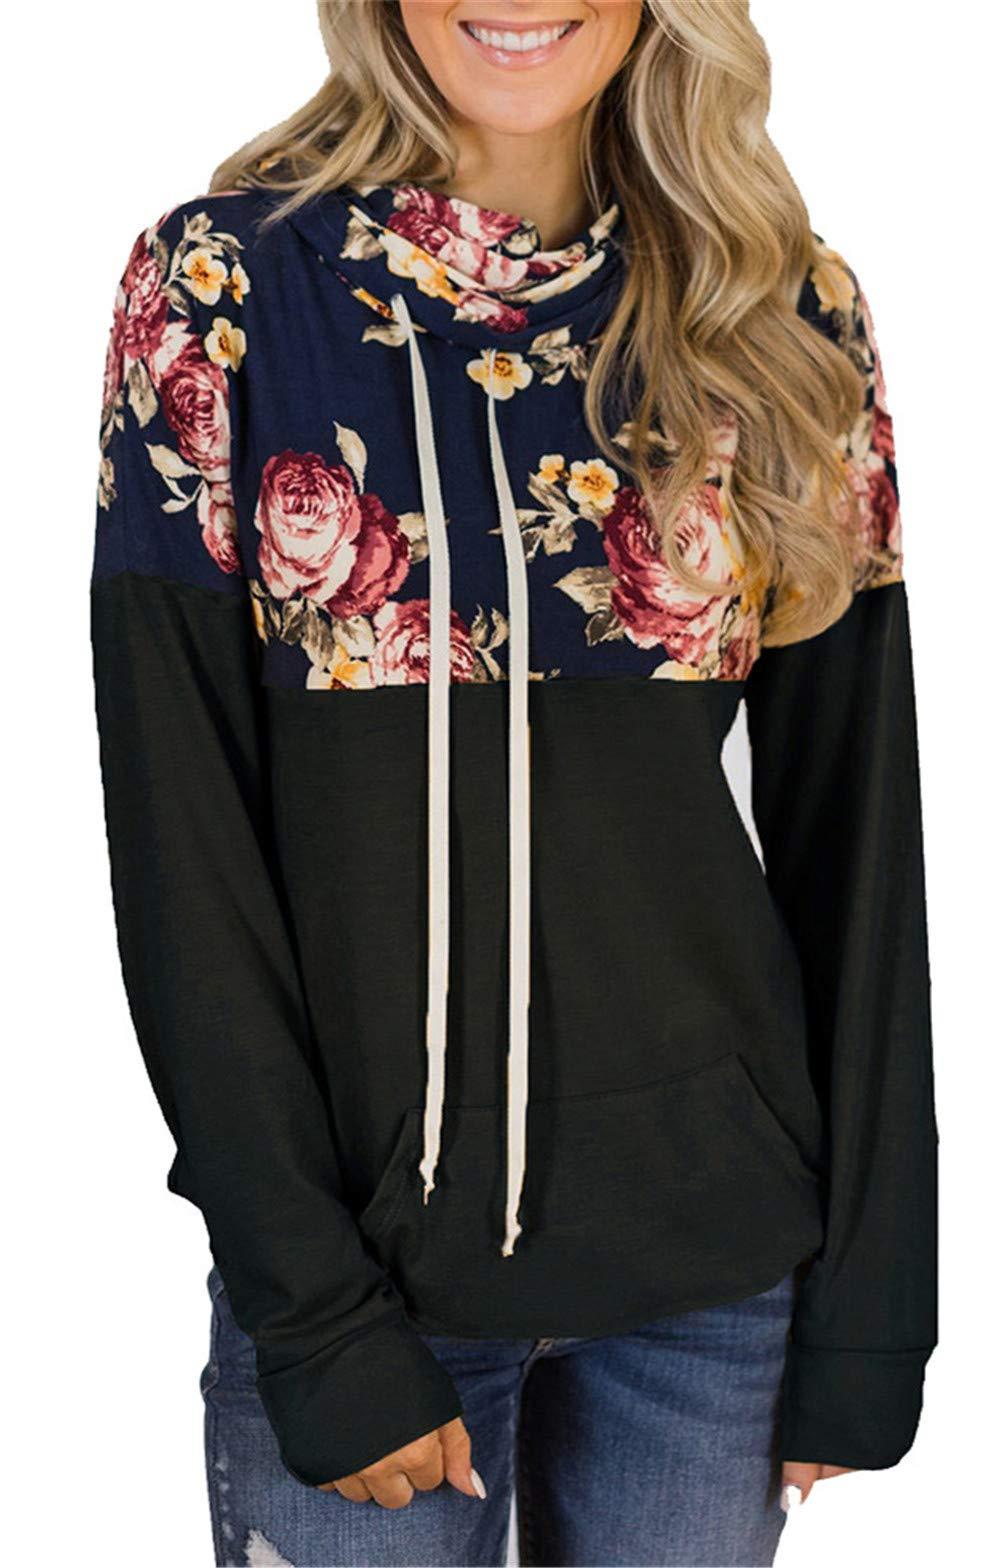 onlypuff Black Pullover Sweatshirt Cowl Neck Sweatshirts Long Sleeve Tunic Tops Color Block XXL